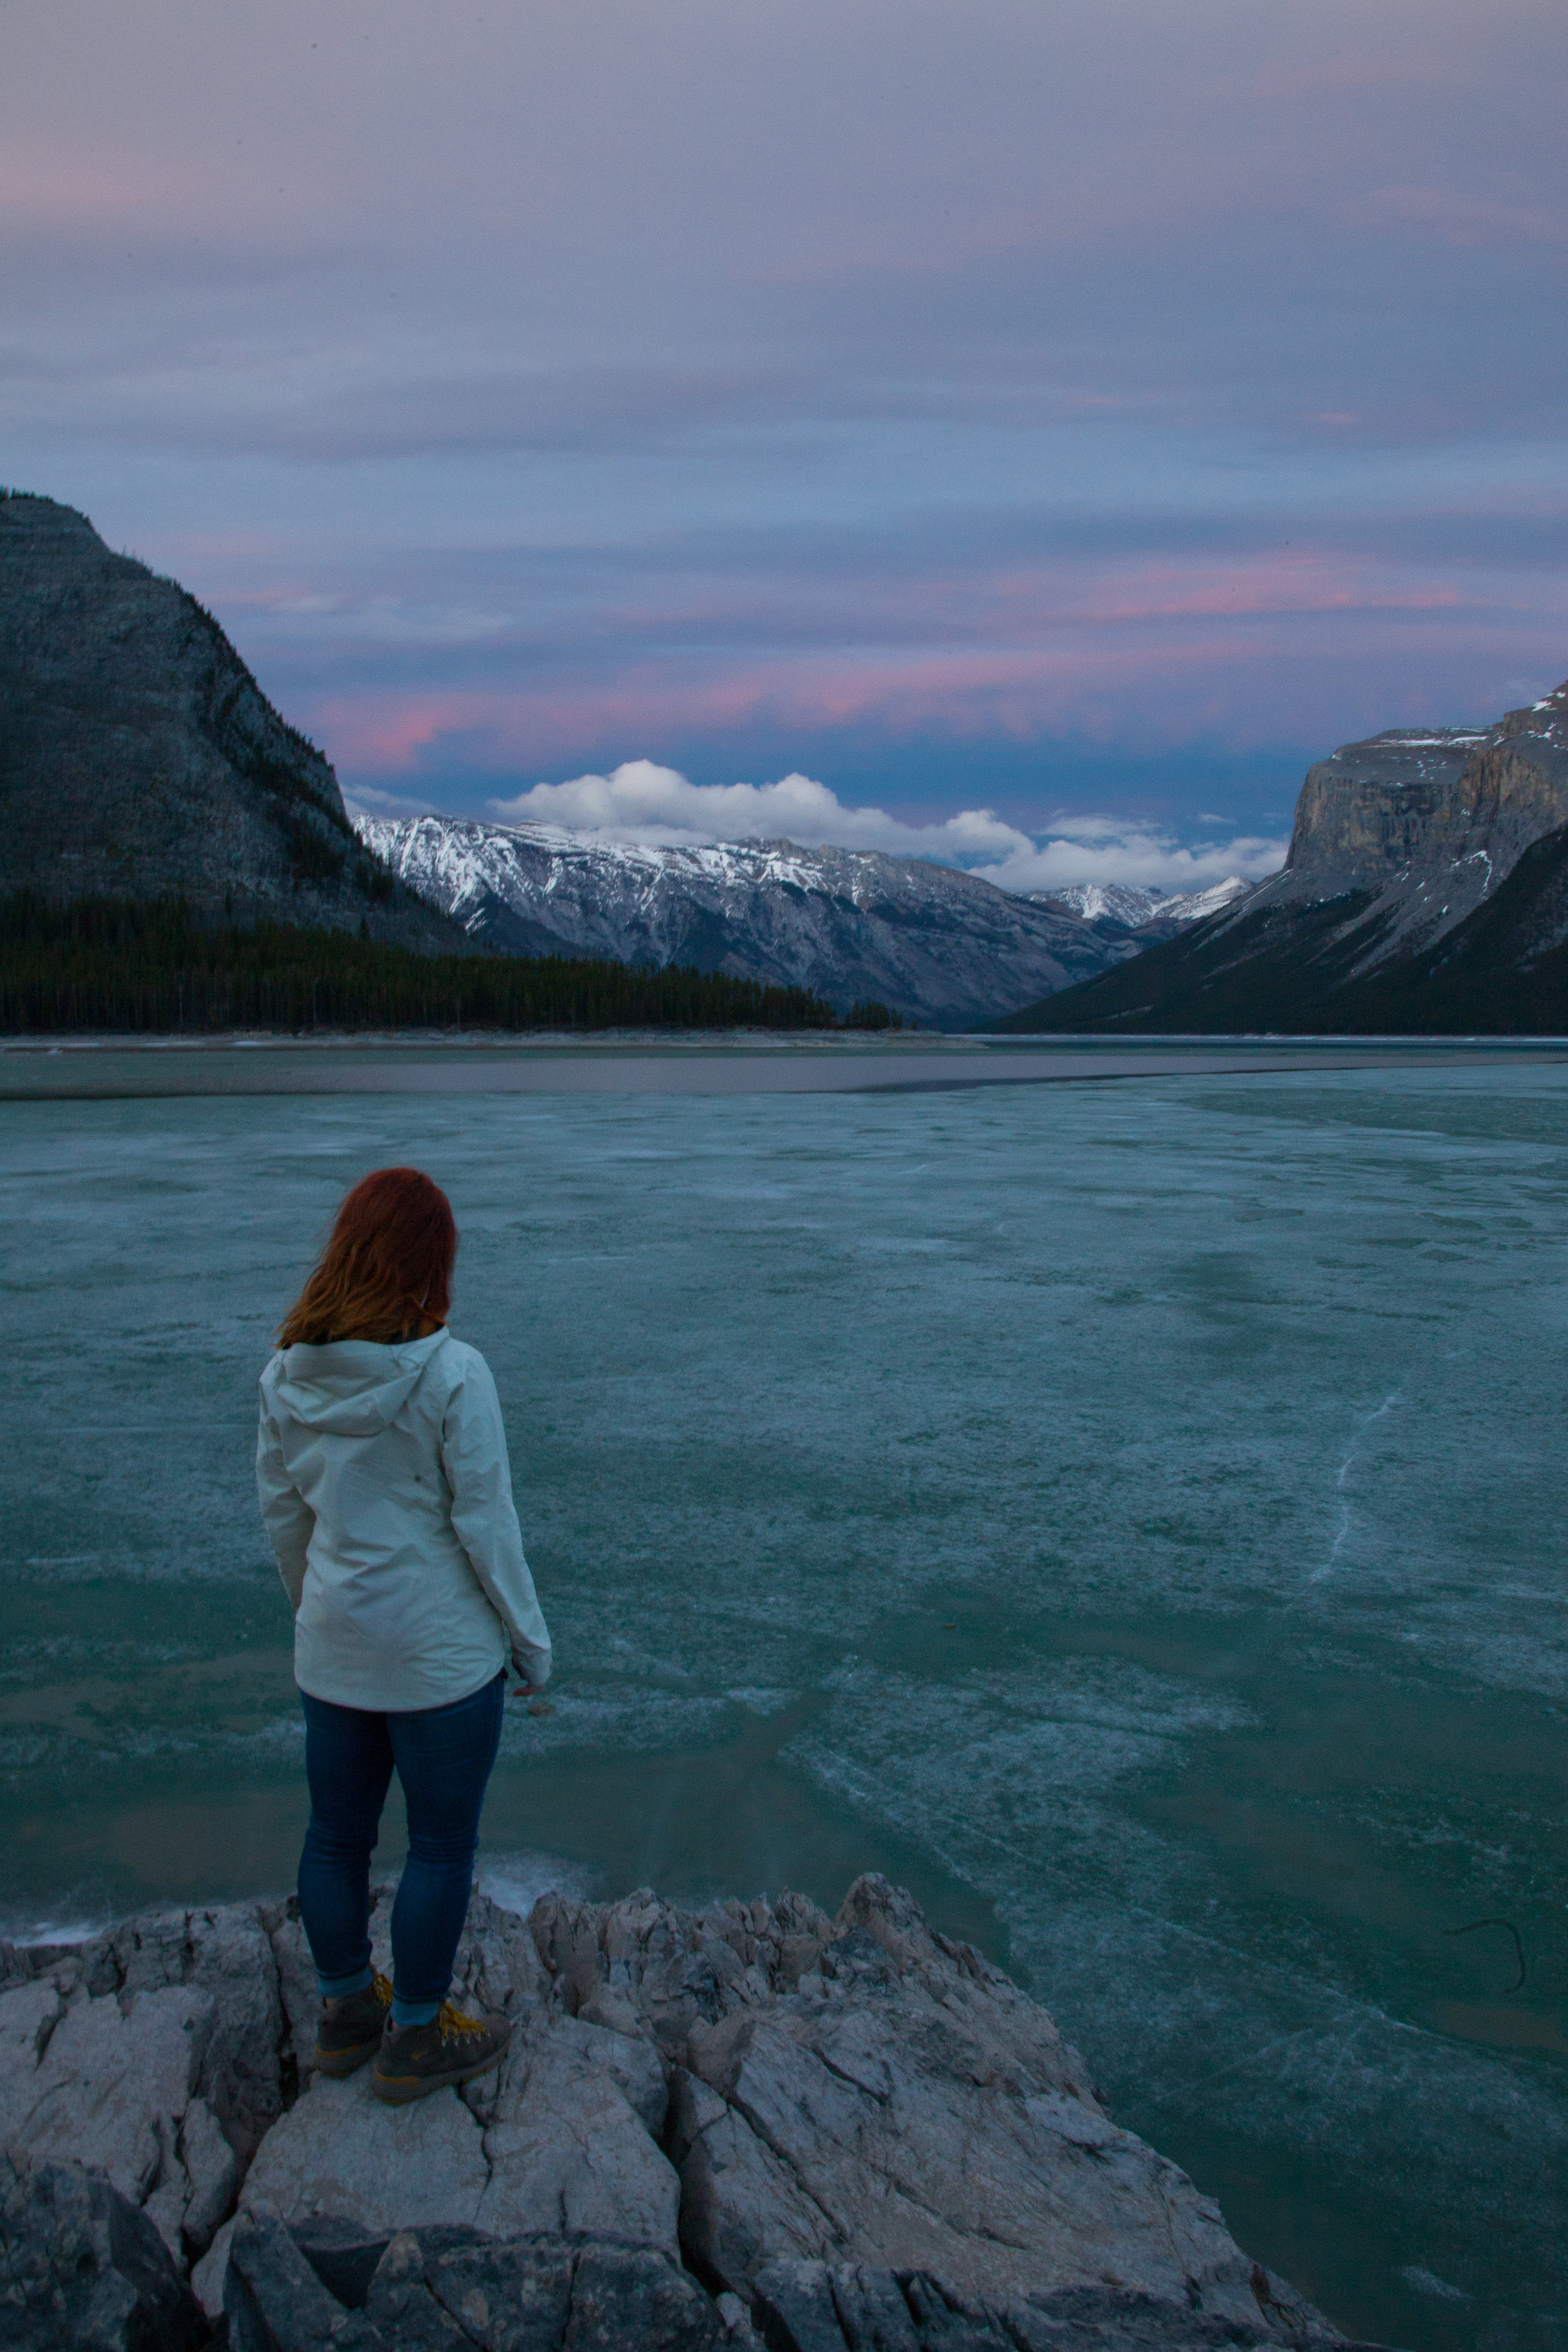 spring-in-banff-national-park-4.jpg